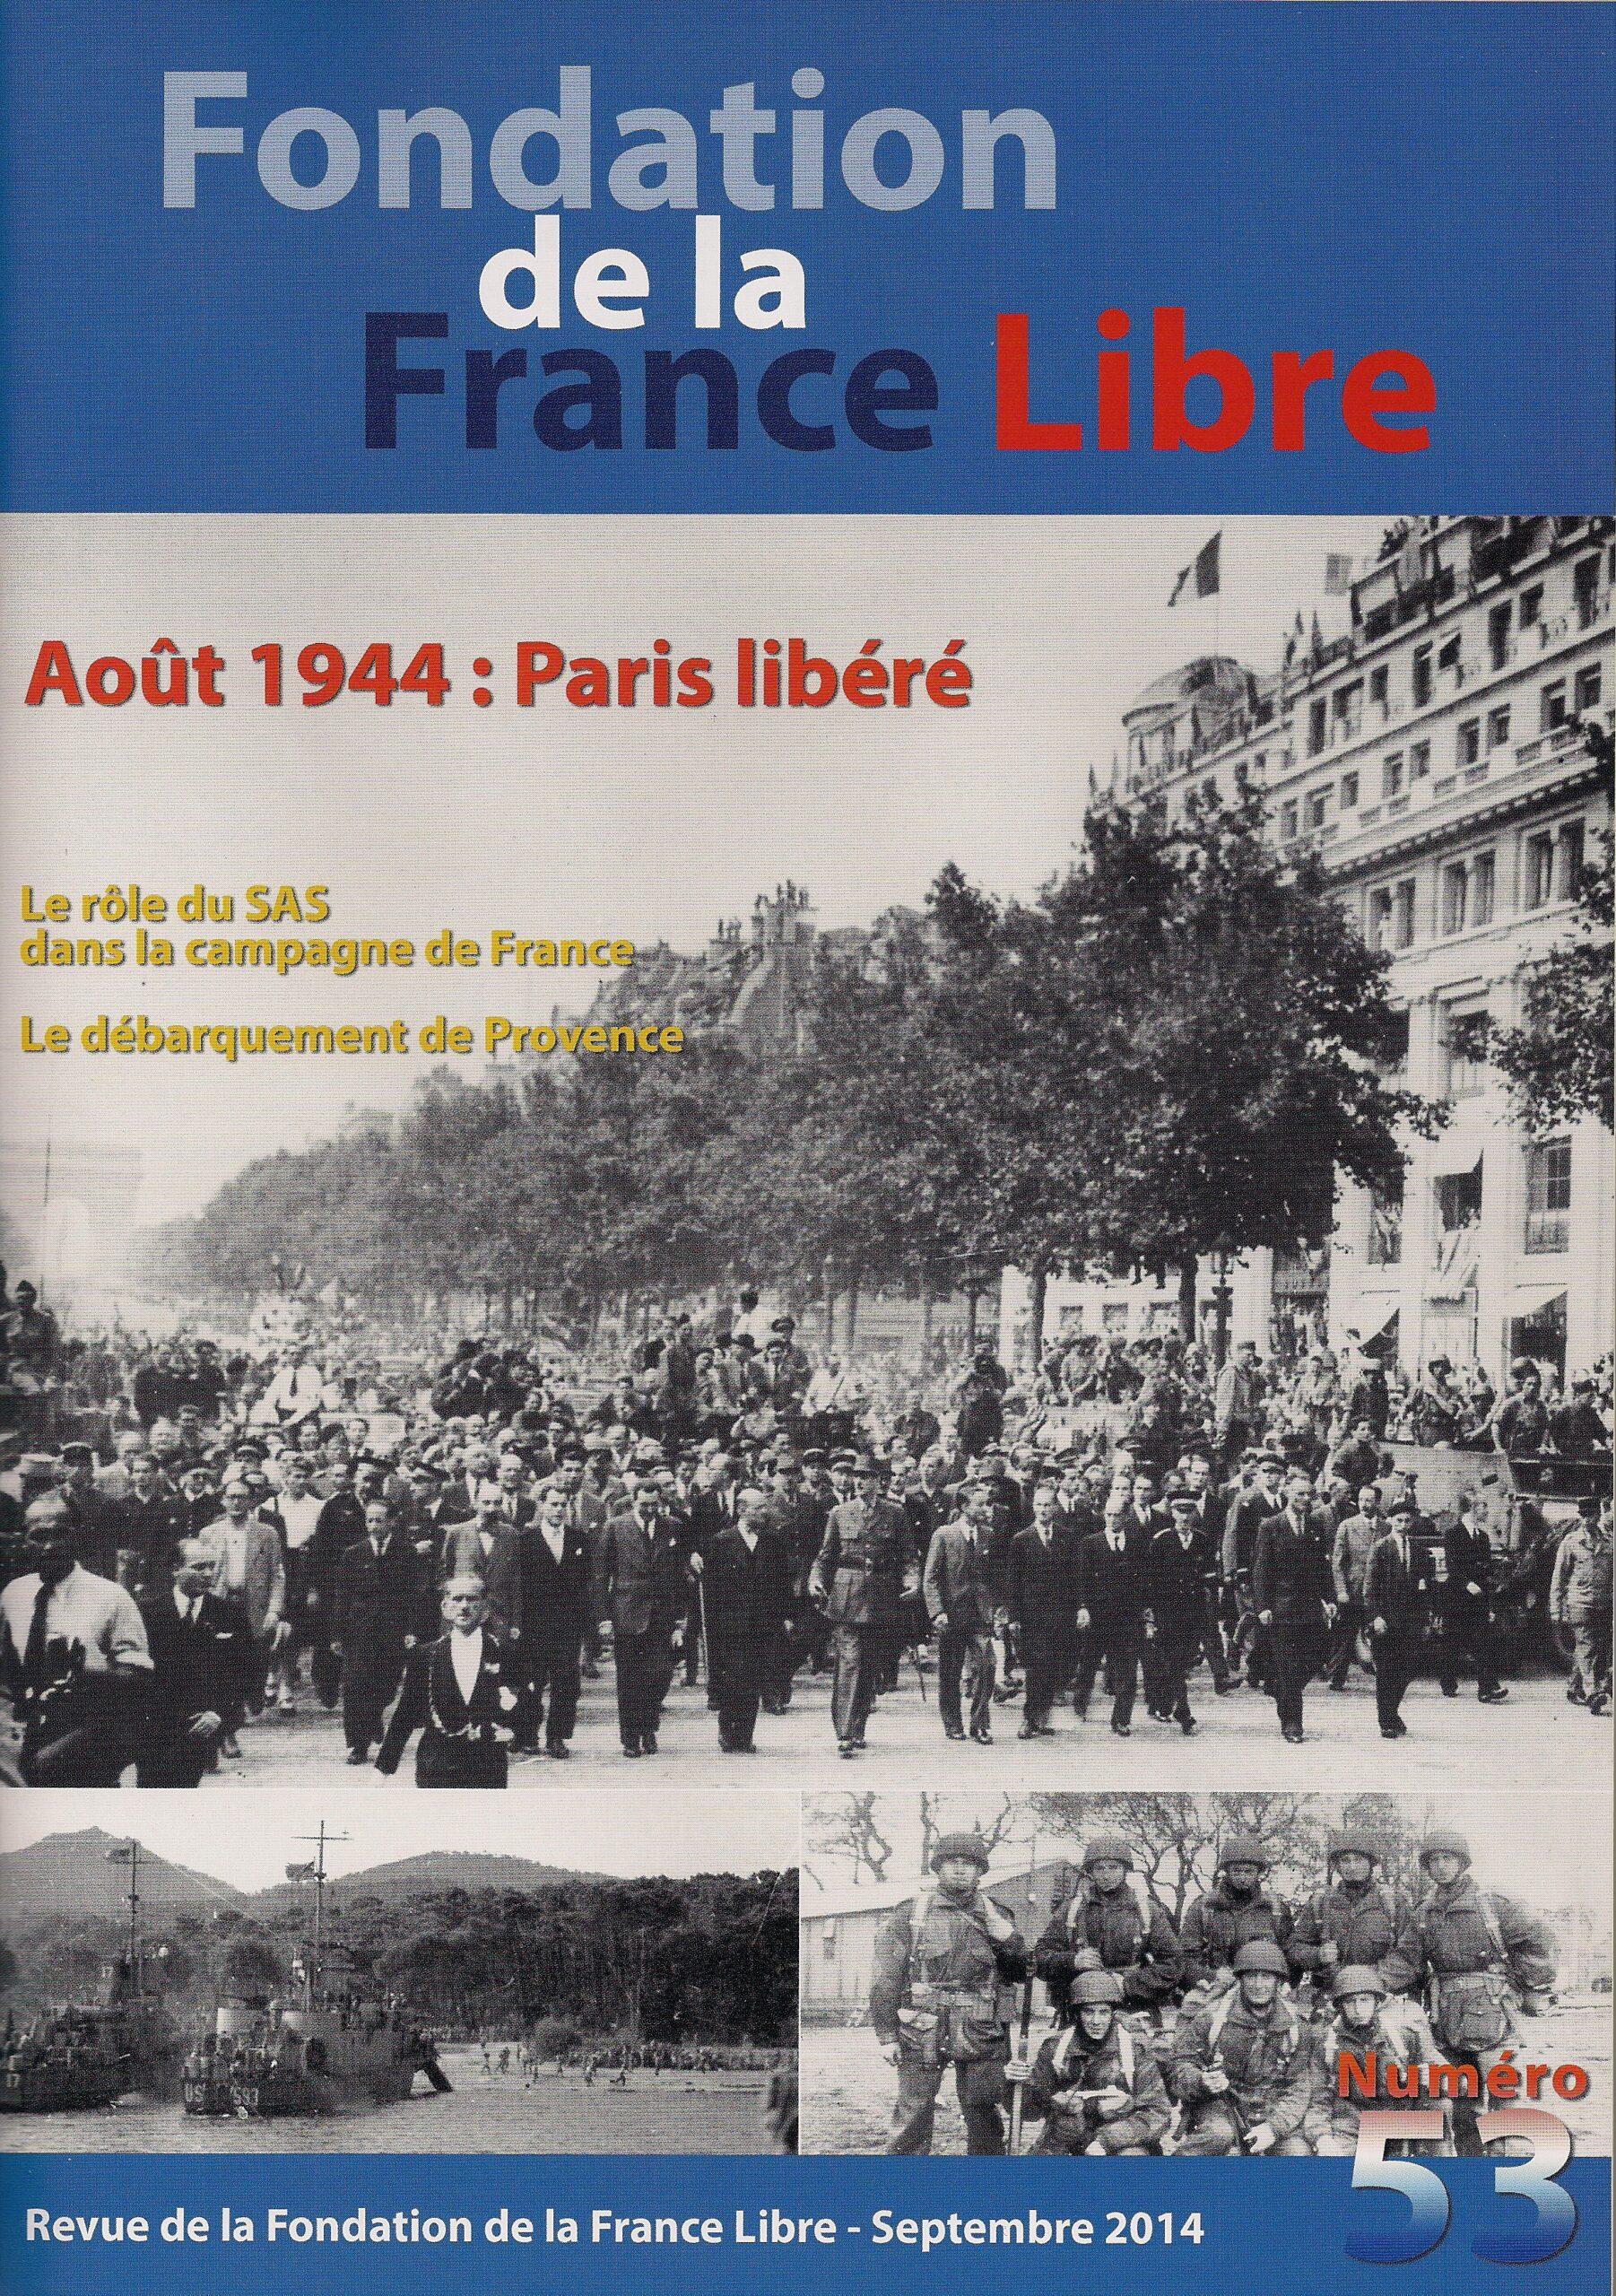 Fondation de la France Libre, n° 53, septembre 2014